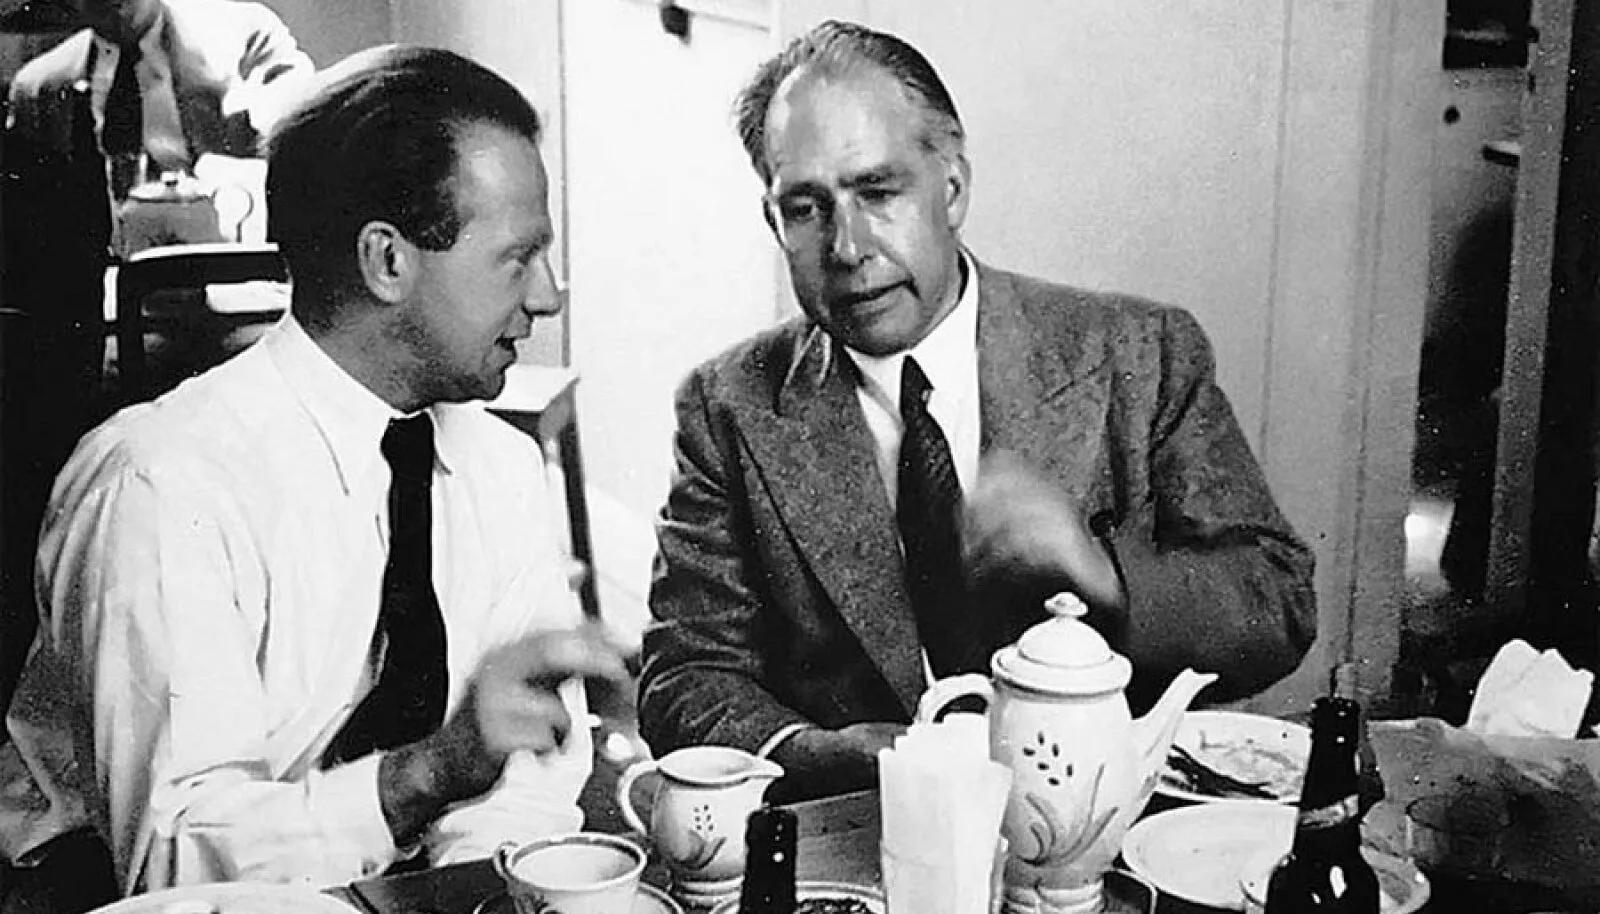 Другой ракурс: Вернер Гейзенберг и Нильс Бор в Копенгагене (начало 1930-х; Emilio Segrè Visual Archives, American Institute of Physics)